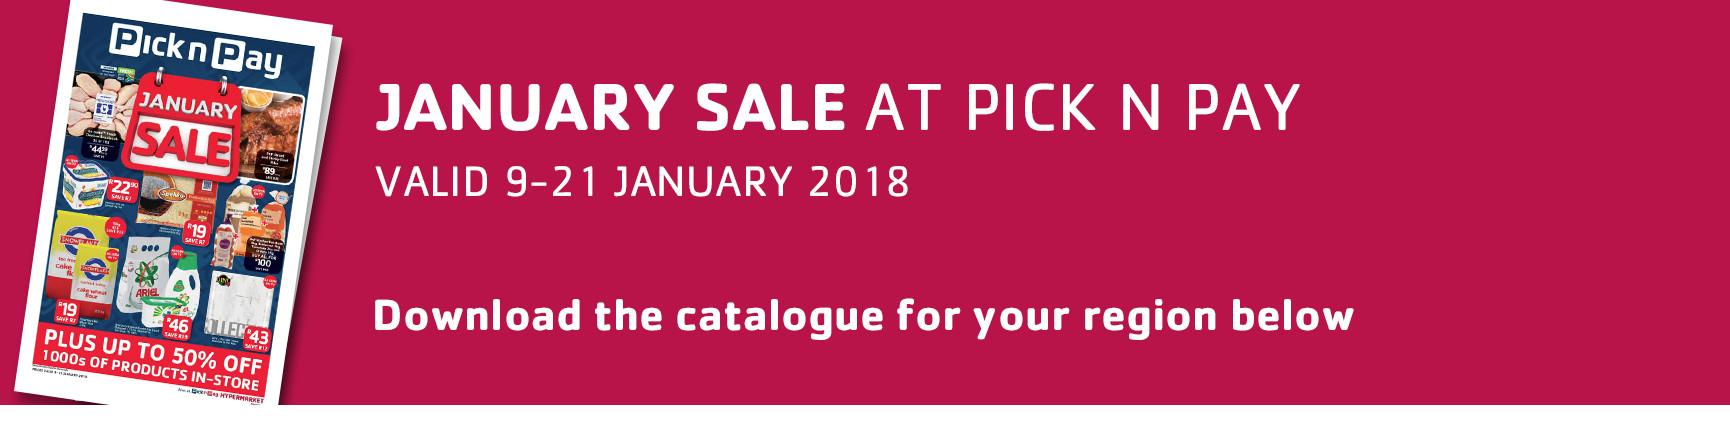 JANUARY SALE AT PICK N PAY 2018 (1).jpg